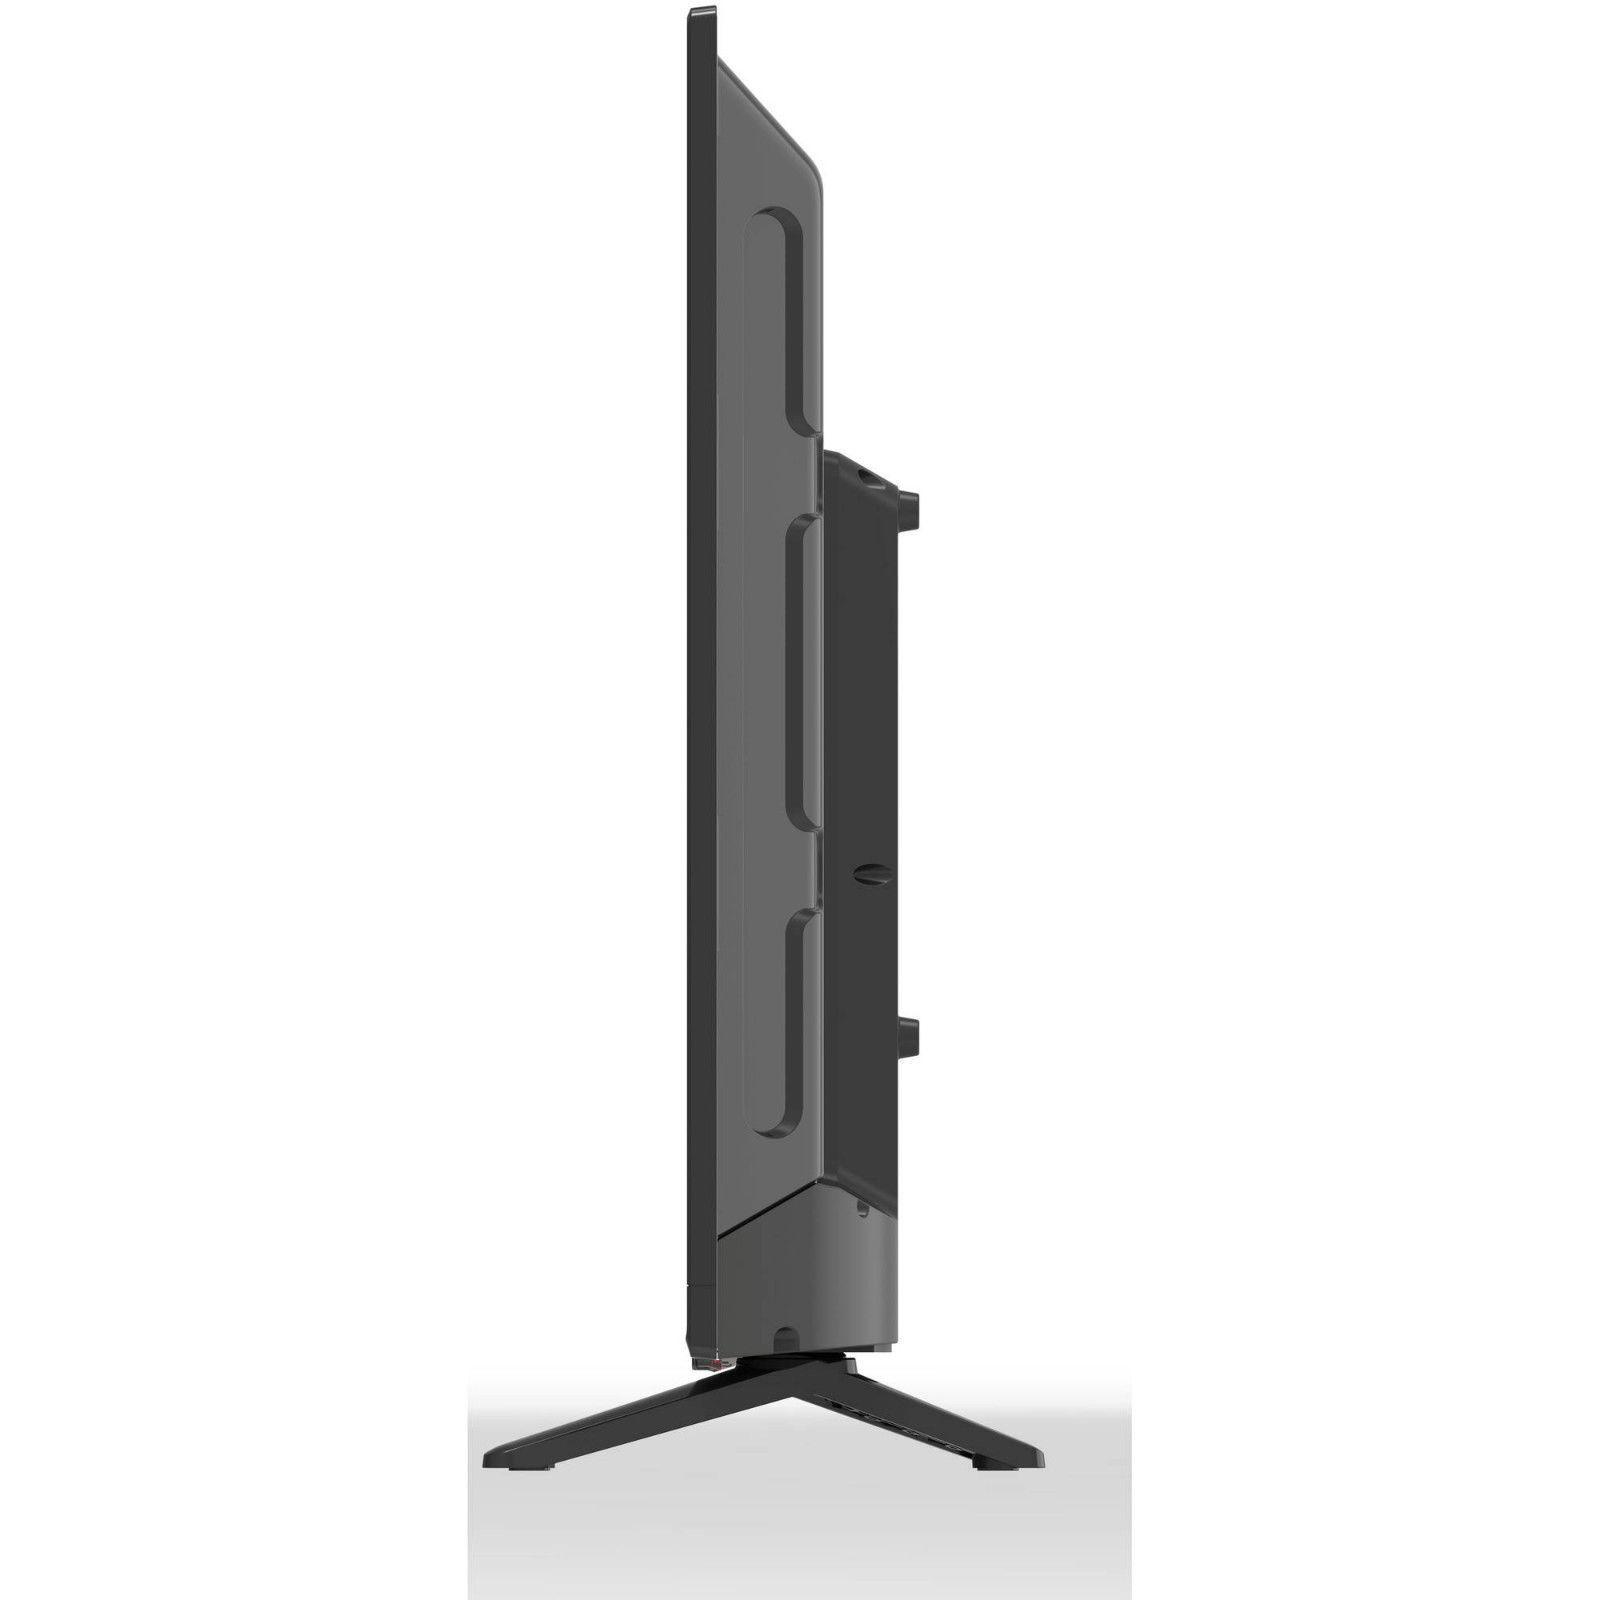 39 inch led flat screen television 720p hi def hdmi hdtv slim wall mountable televisions. Black Bedroom Furniture Sets. Home Design Ideas